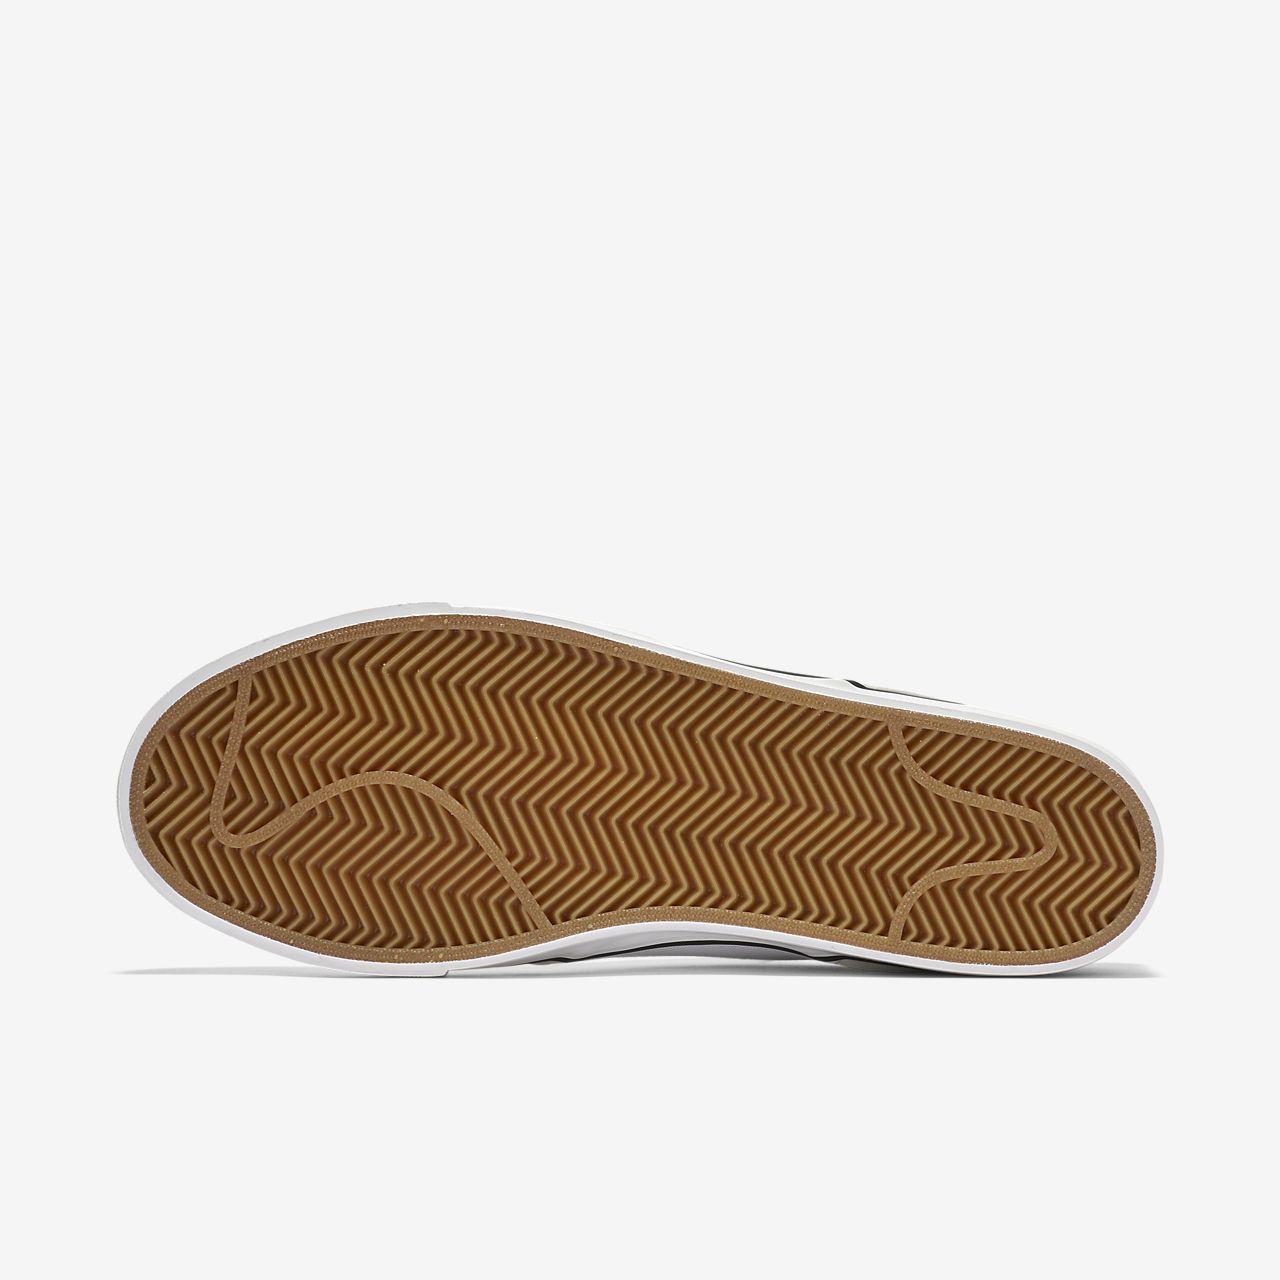 Nike SB Zoom Zoom Zoom Stefan Janoski Canvas Herren-Skateboardschuh    | Sale Online  6c9c64